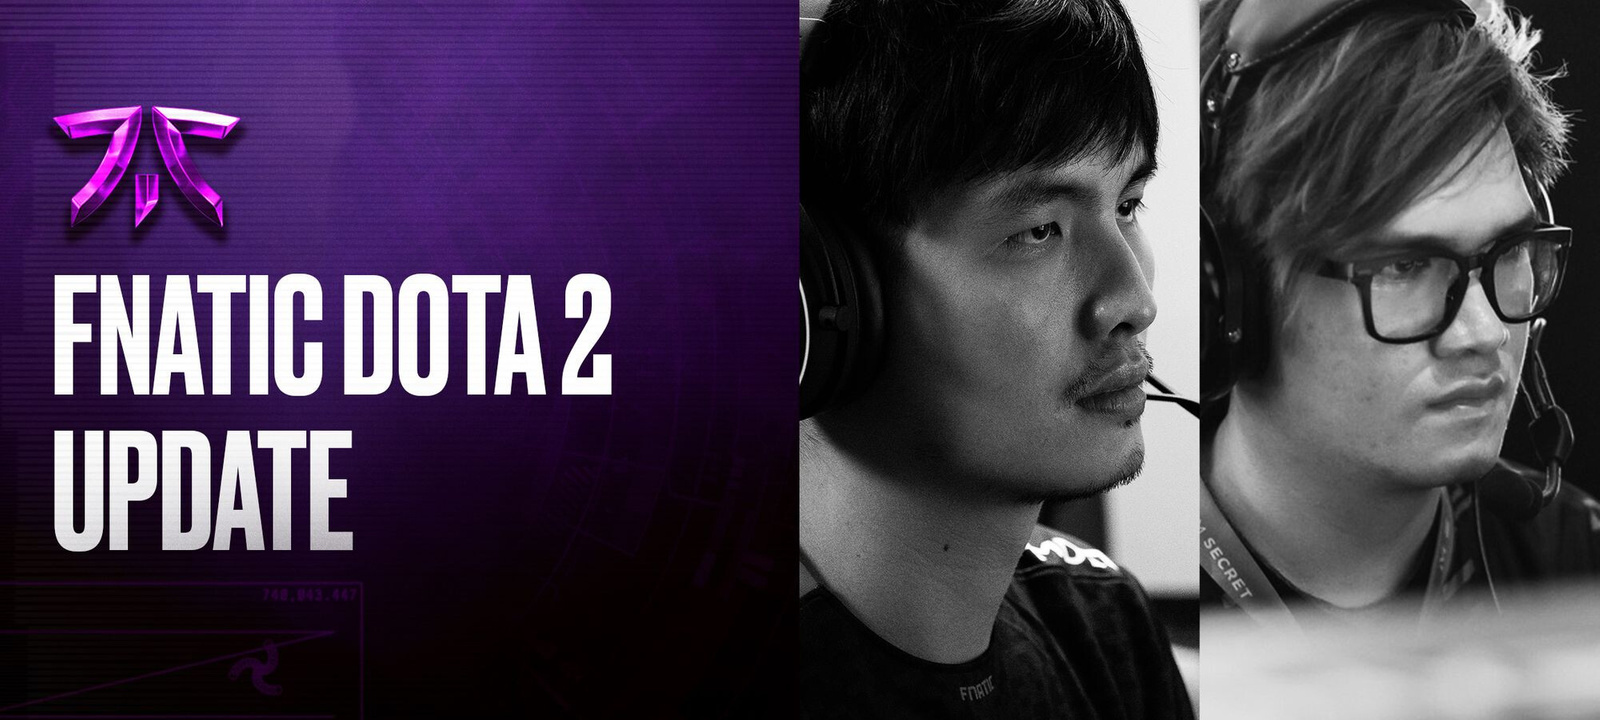 An update on Fnatic Dota 2